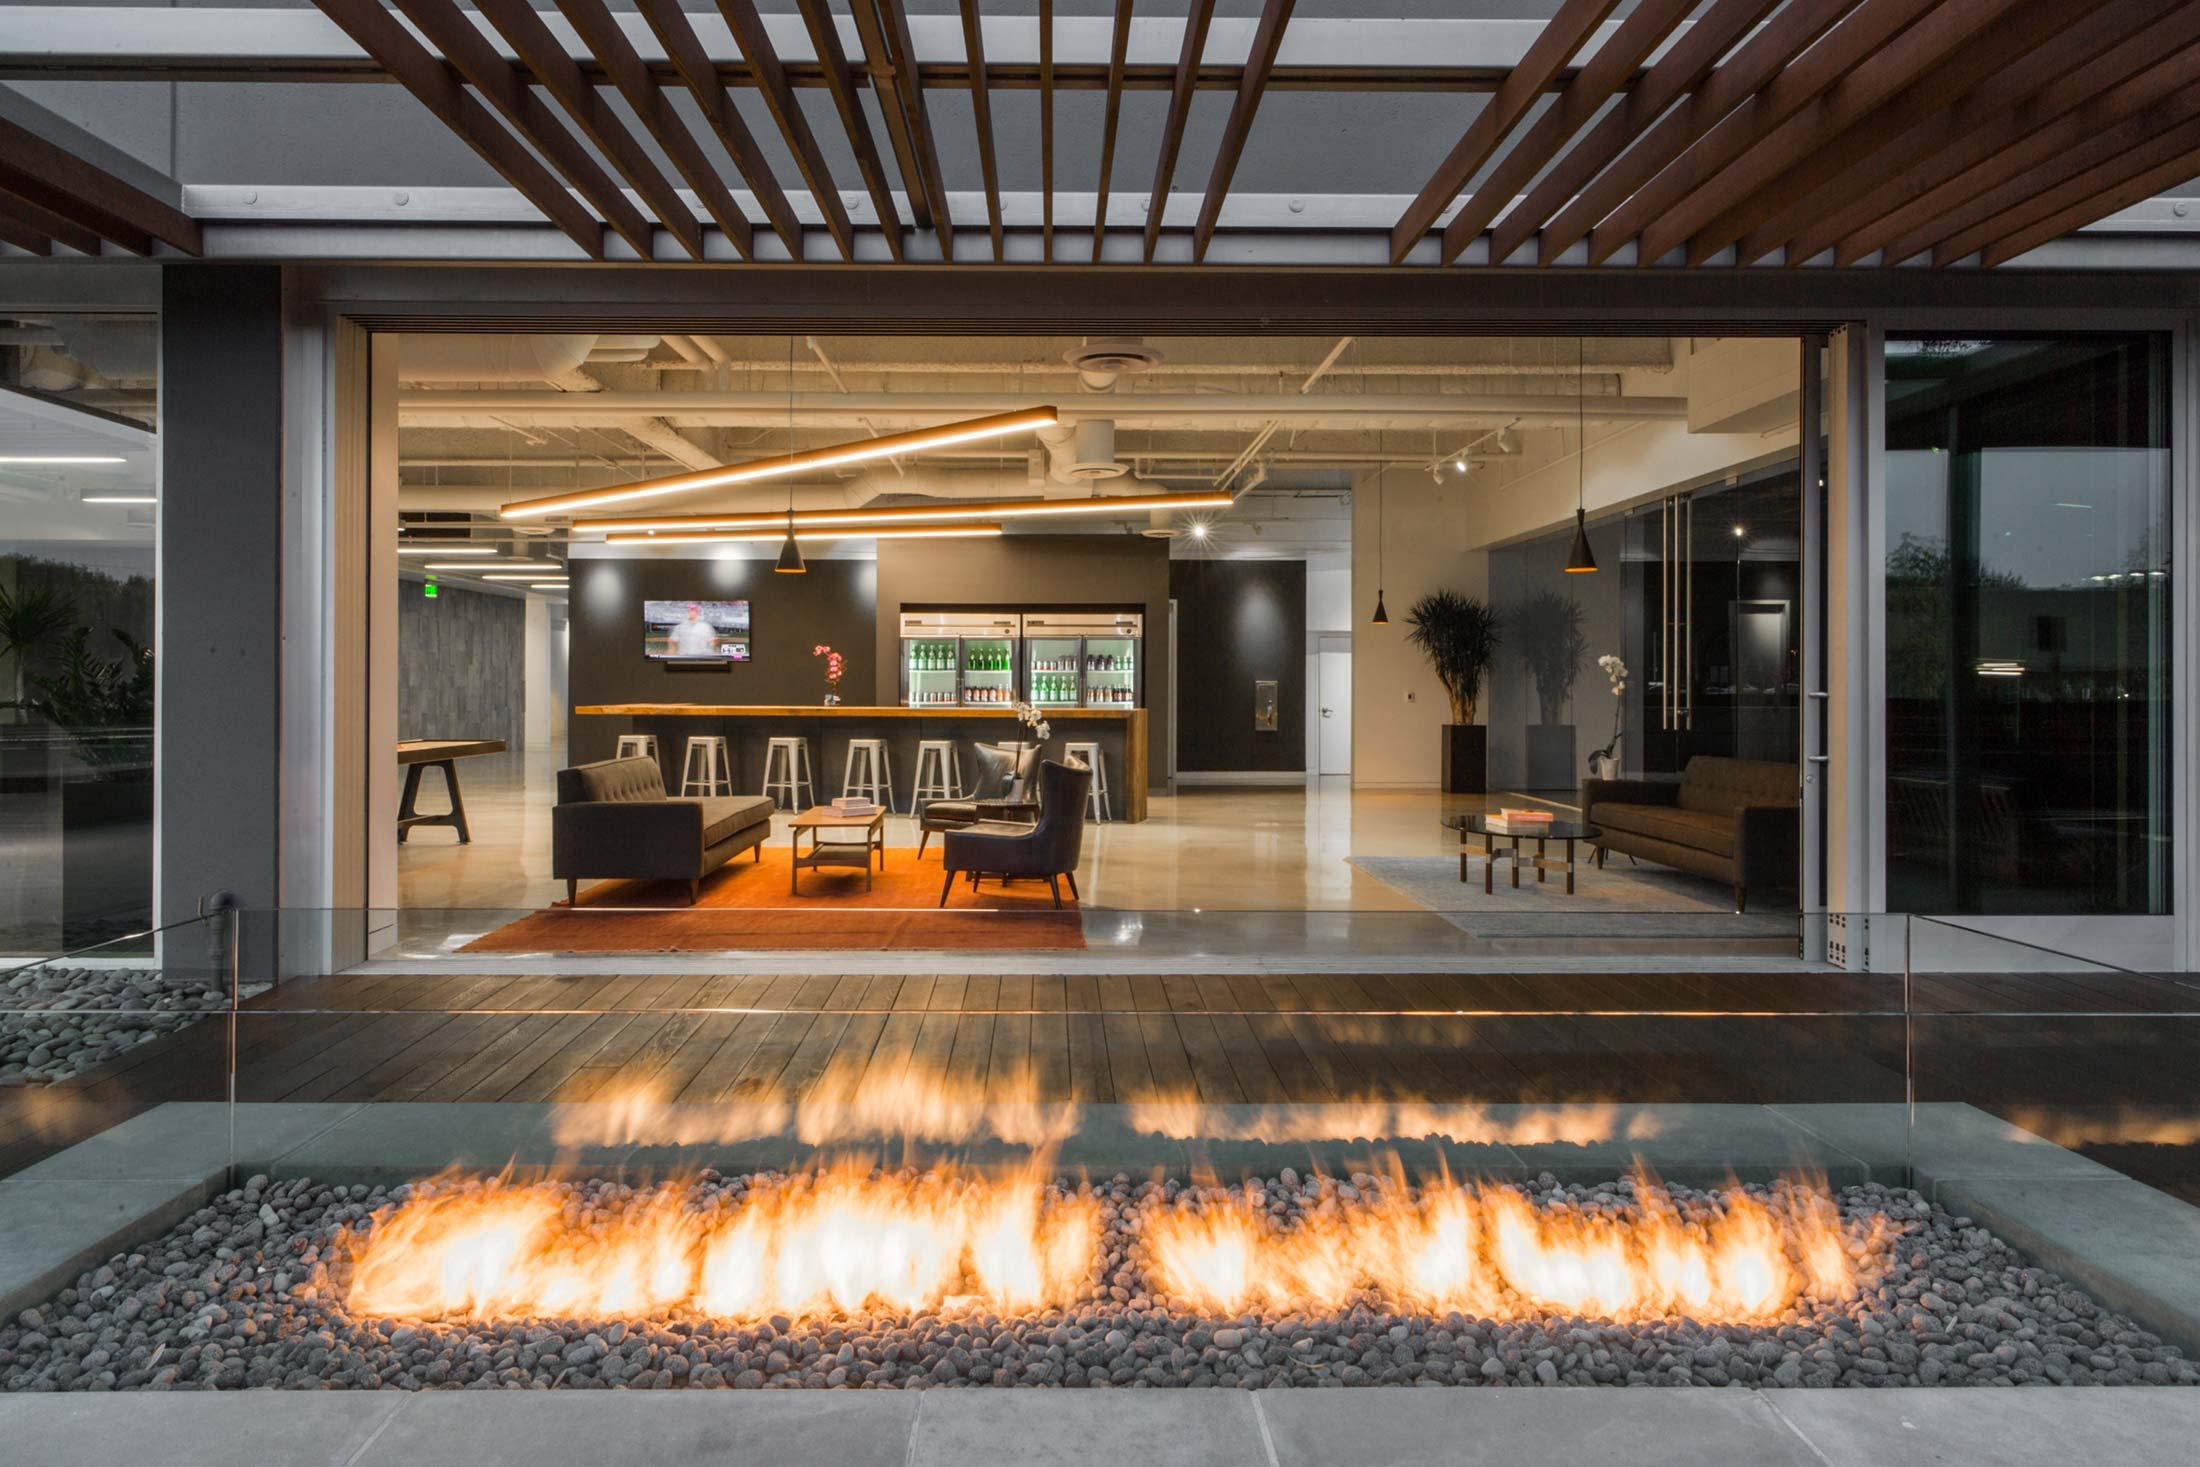 modern-architecture-building-commercial-california-shubindonaldson-2101elsegundo-03